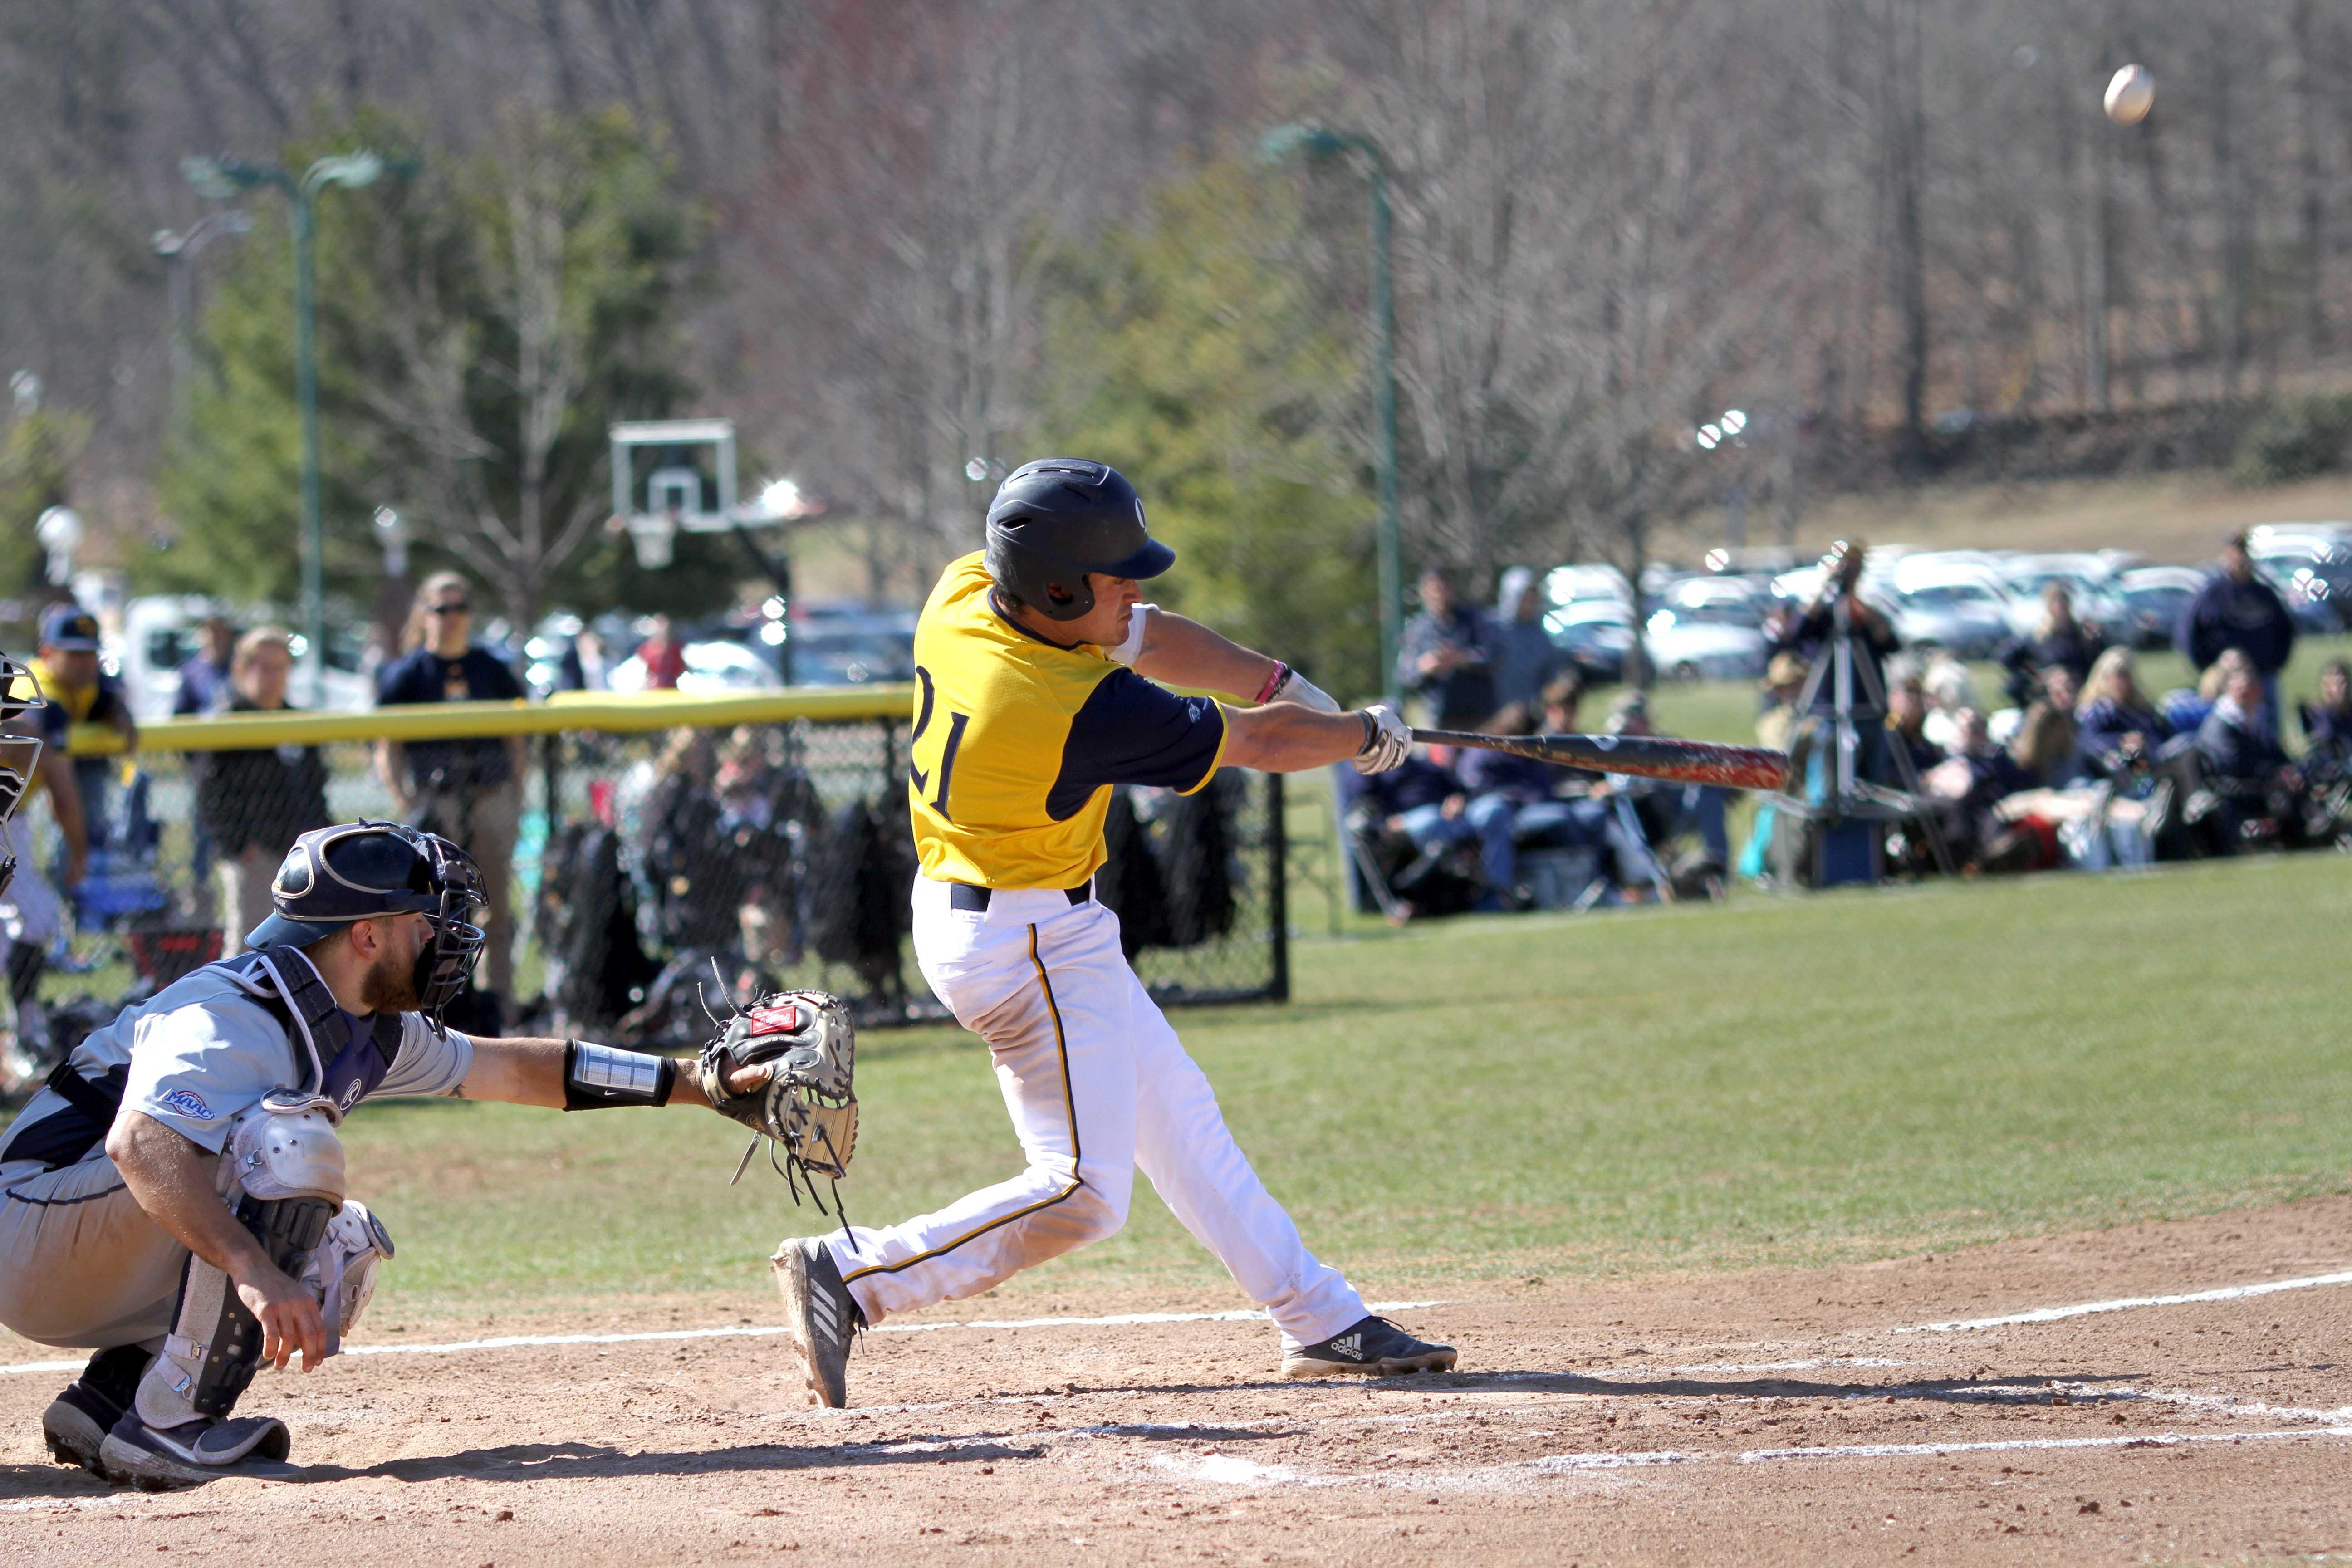 Quinnipiac baseball drops both games on Saturday against Canisius